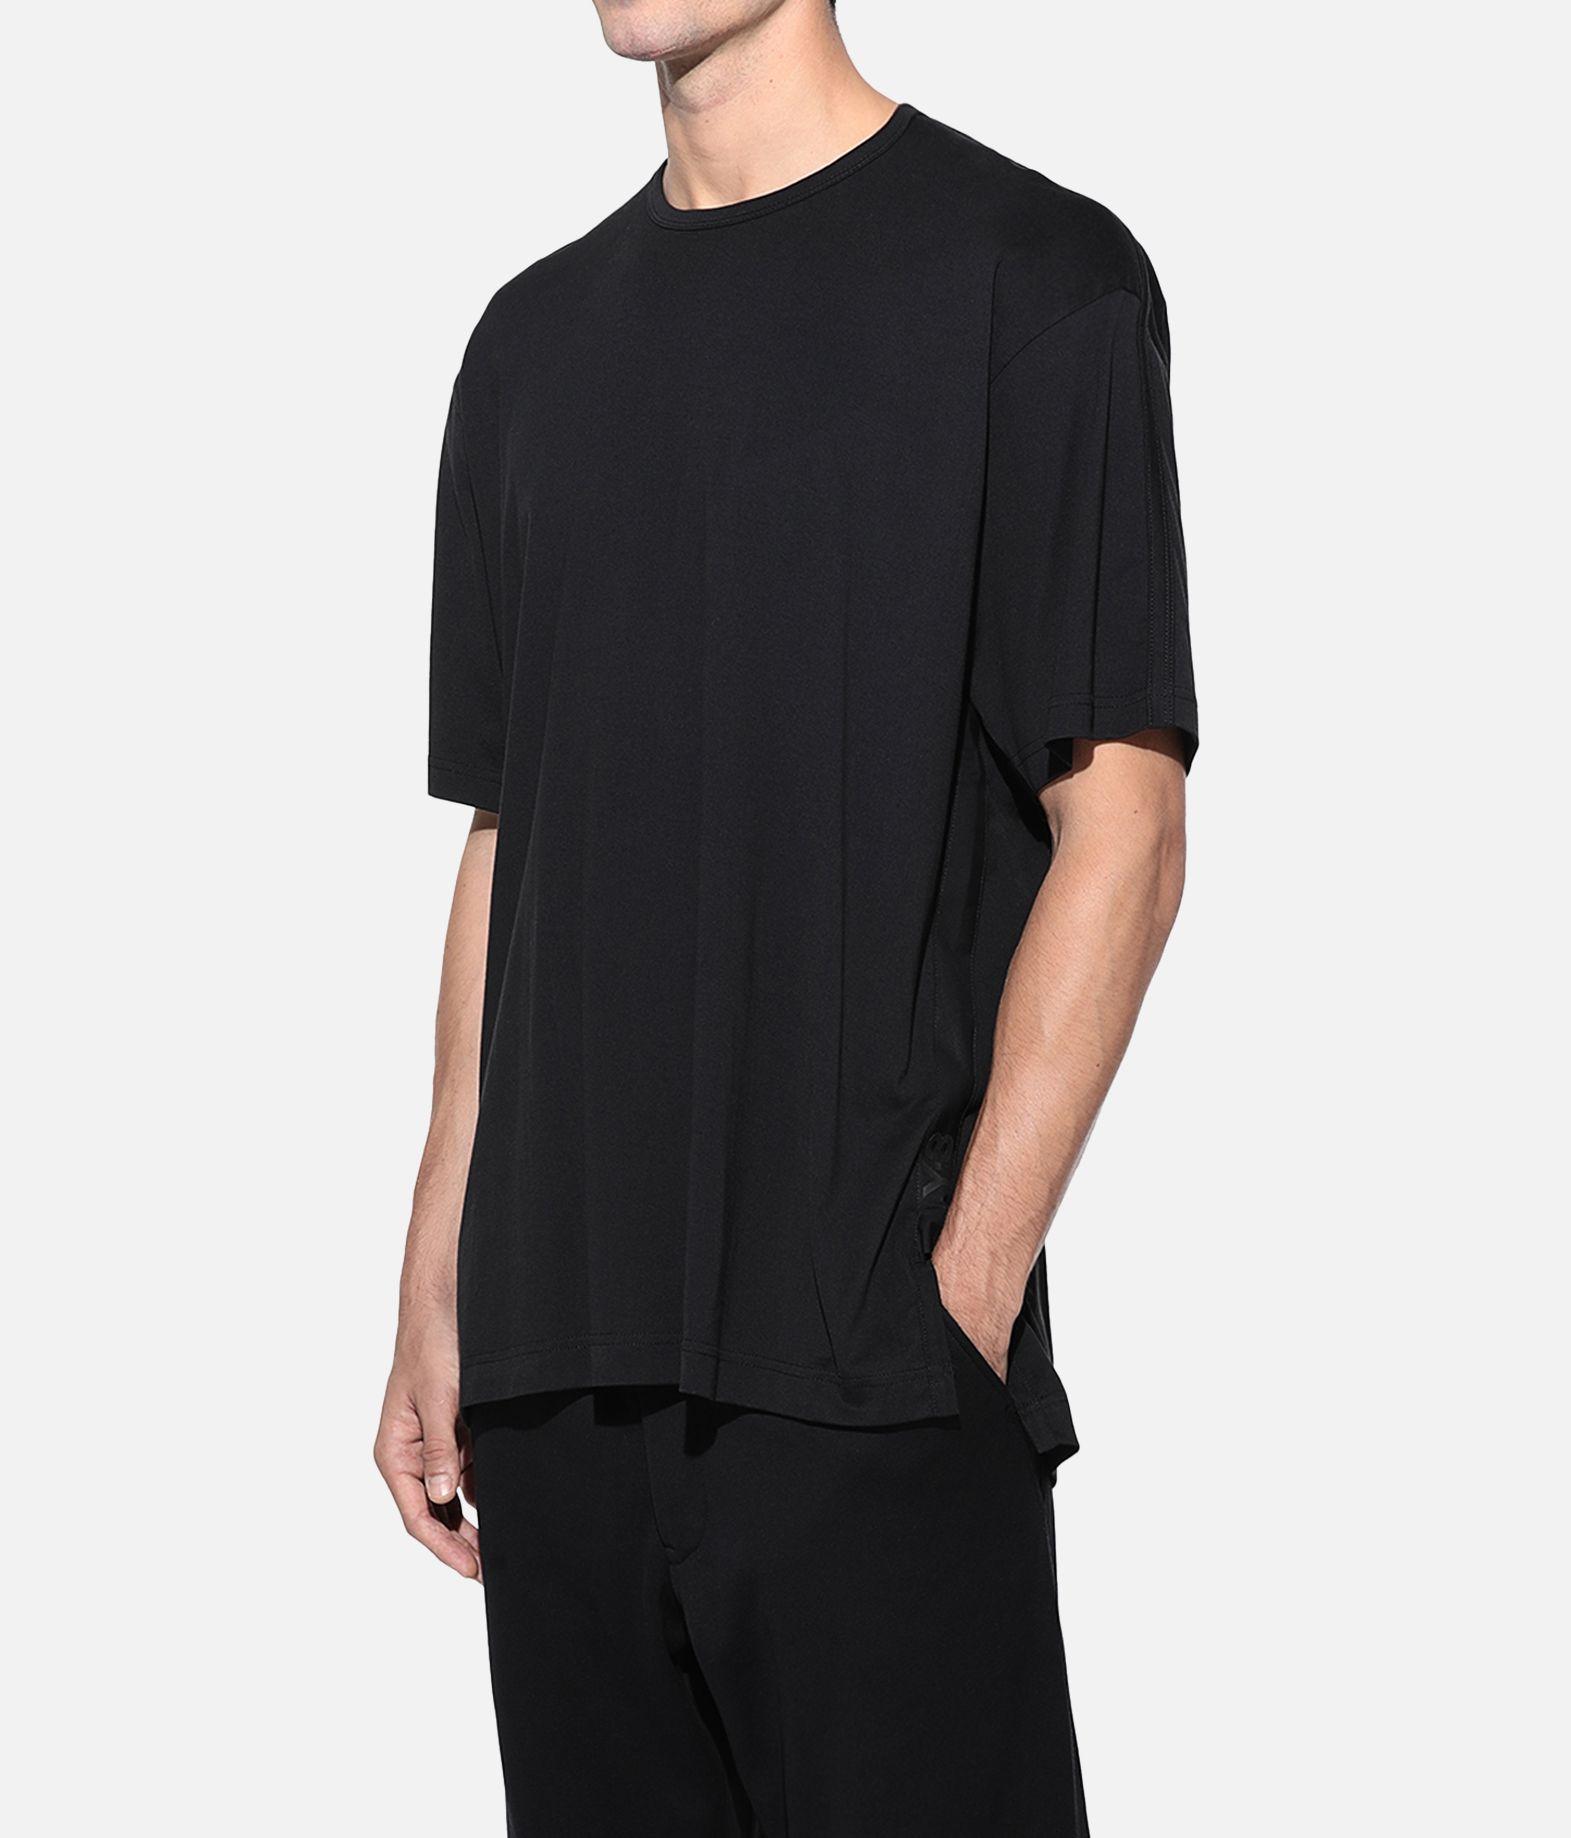 Y-3 Y-3 Parachute Tee Short sleeve t-shirt Man e